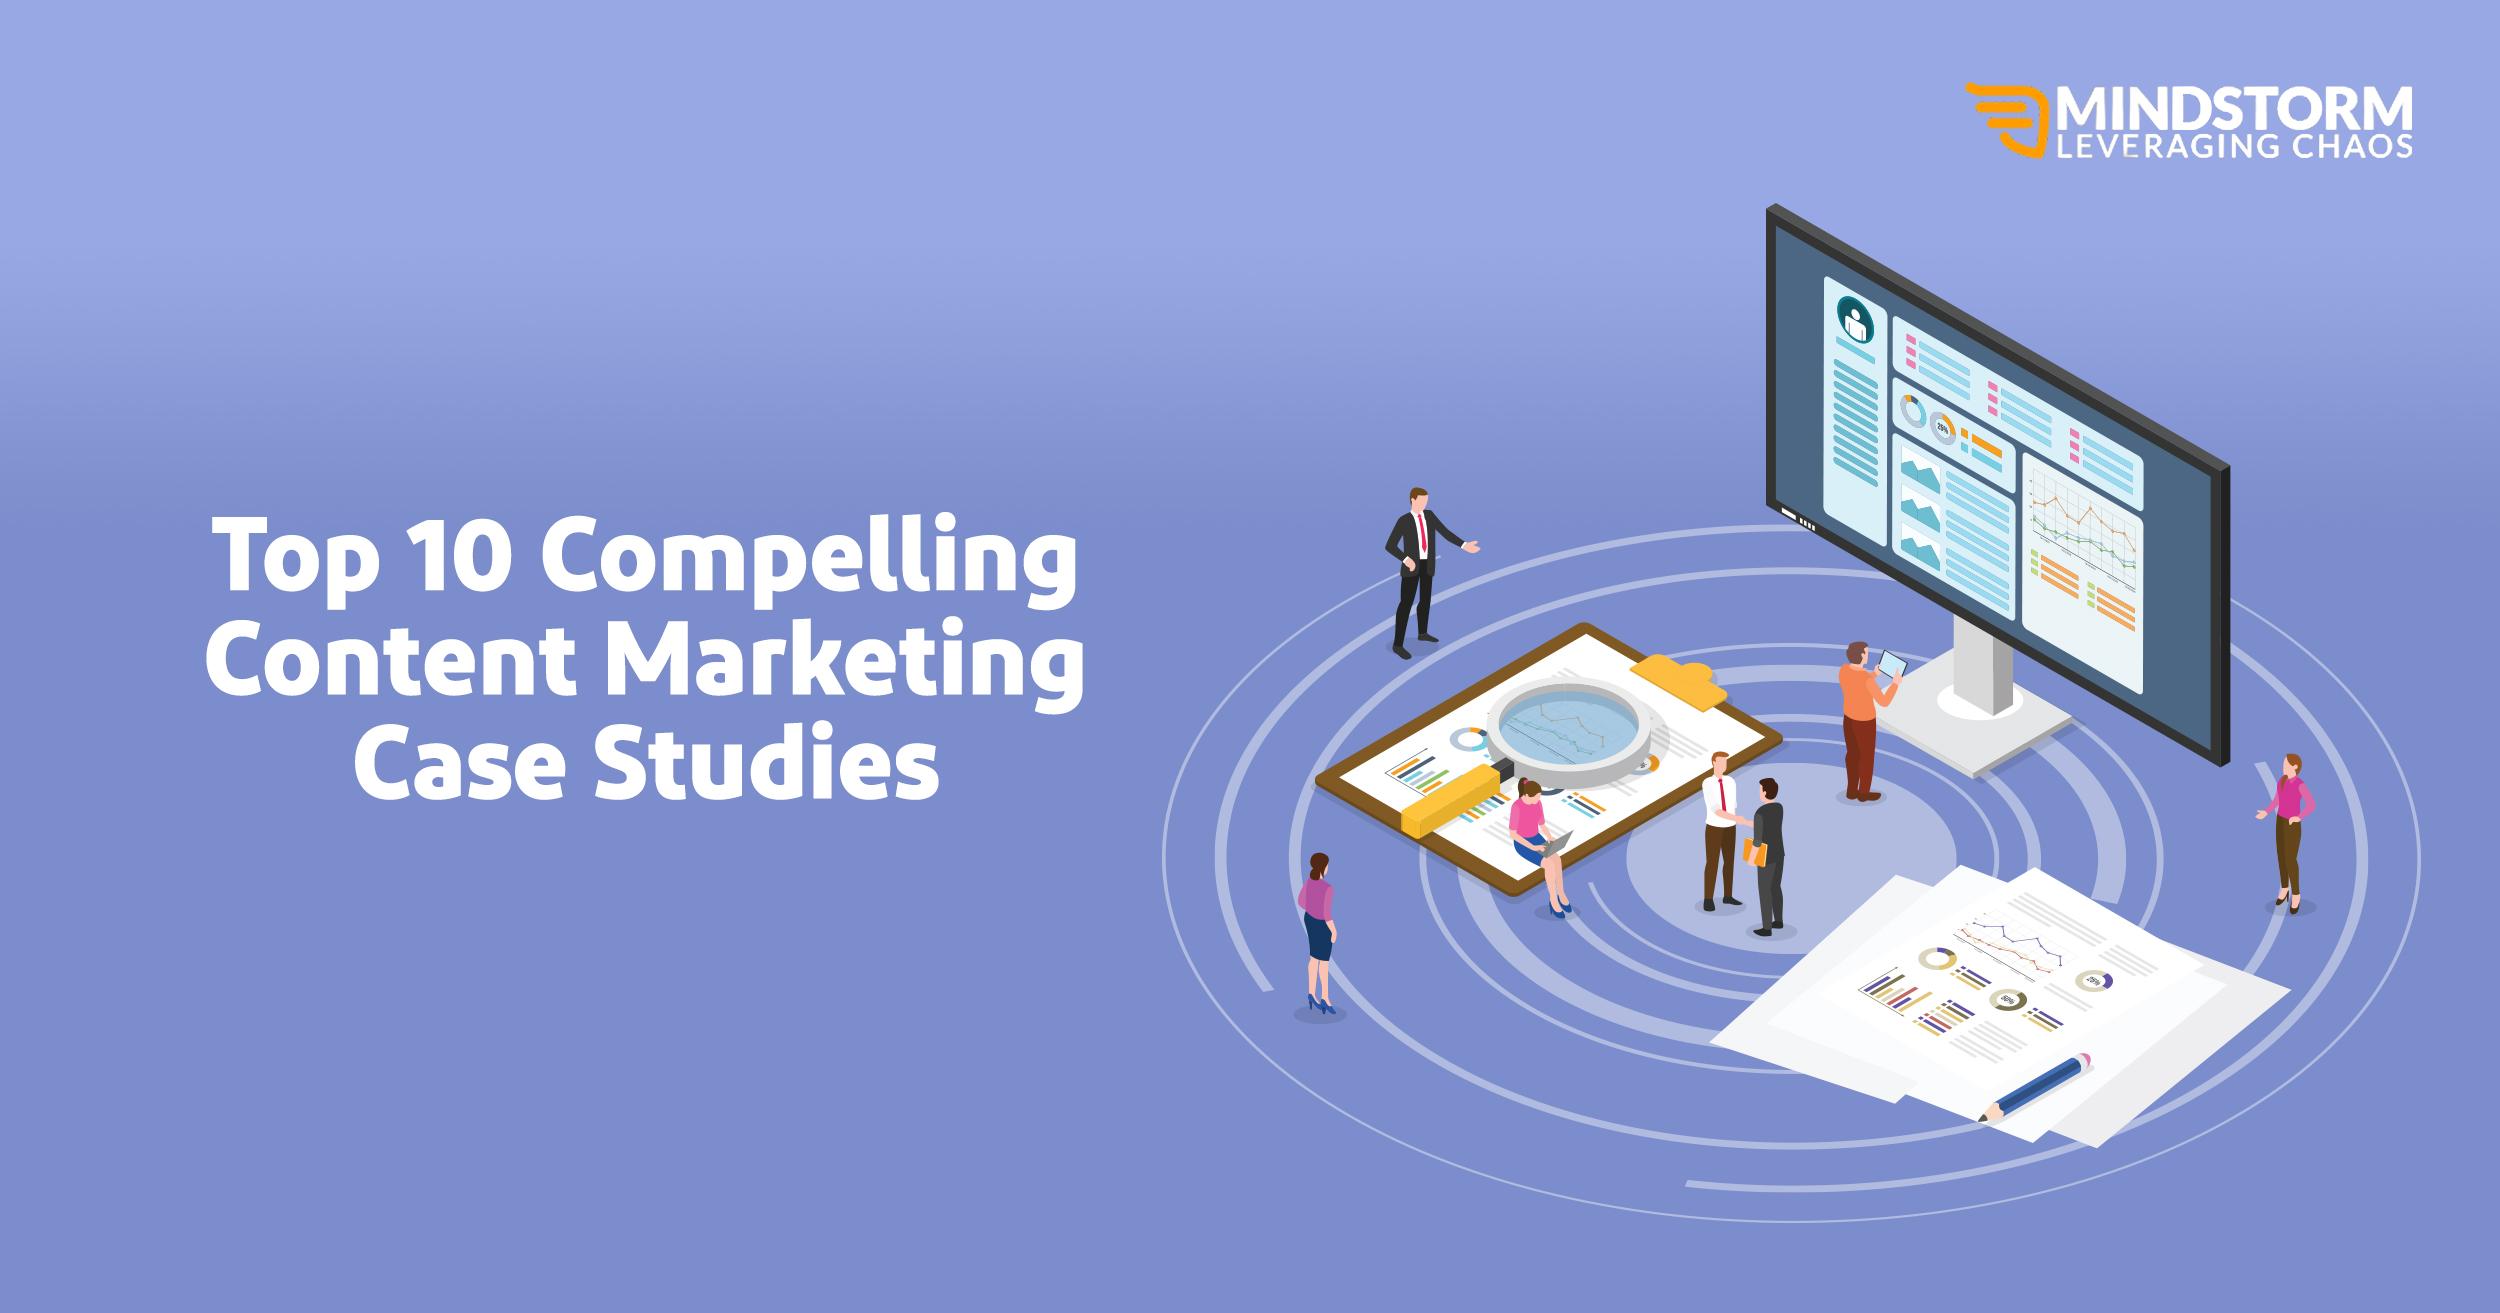 Top 10 Compelling Content Marketing Case Studies